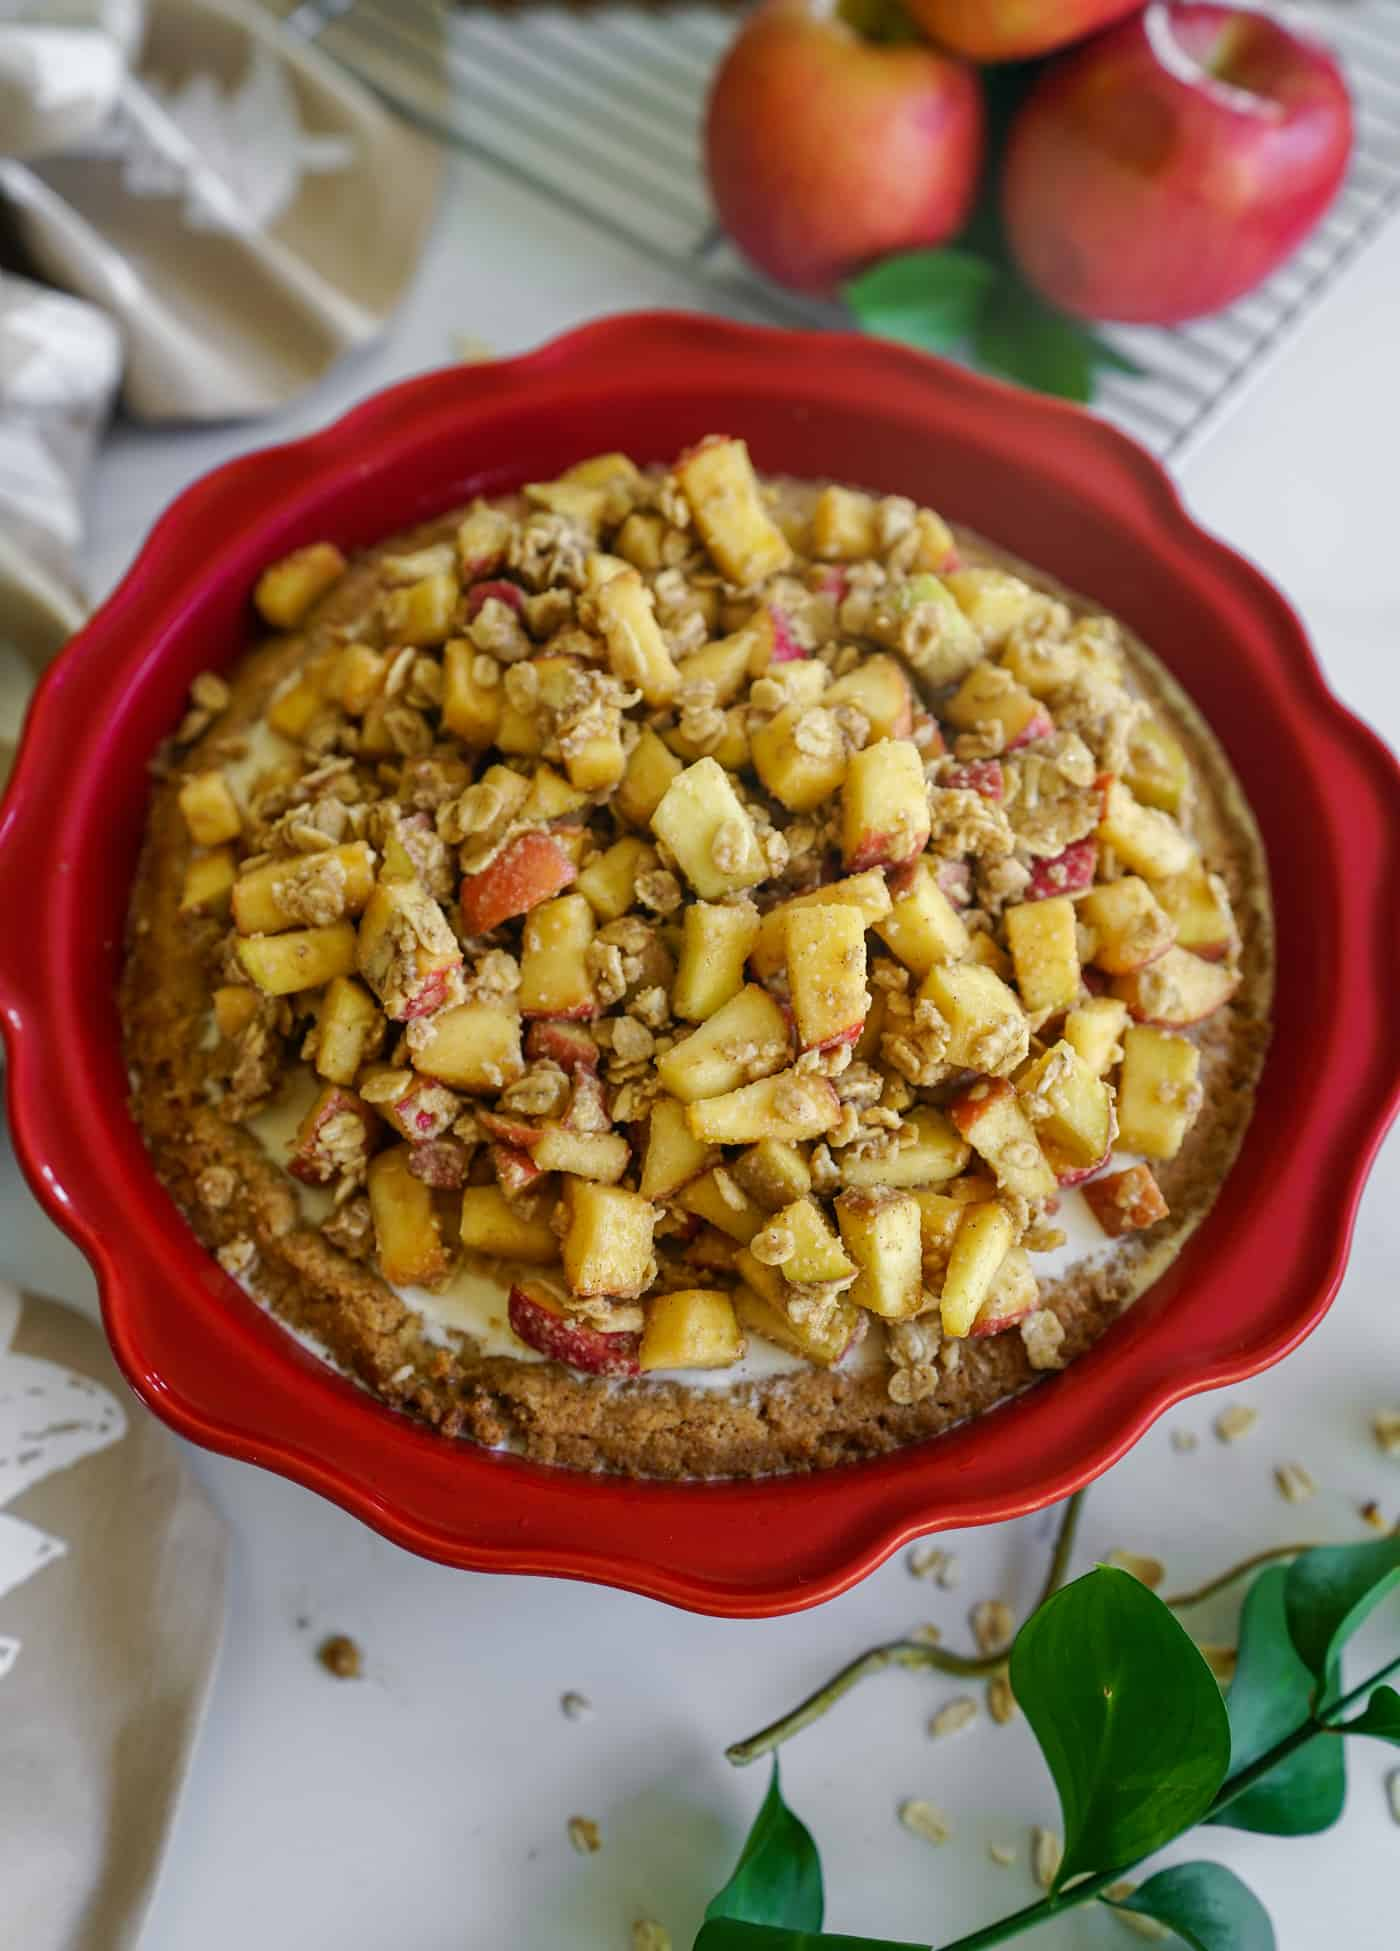 A Lily Love Affair shares an apple crisp ice cream pie recipe